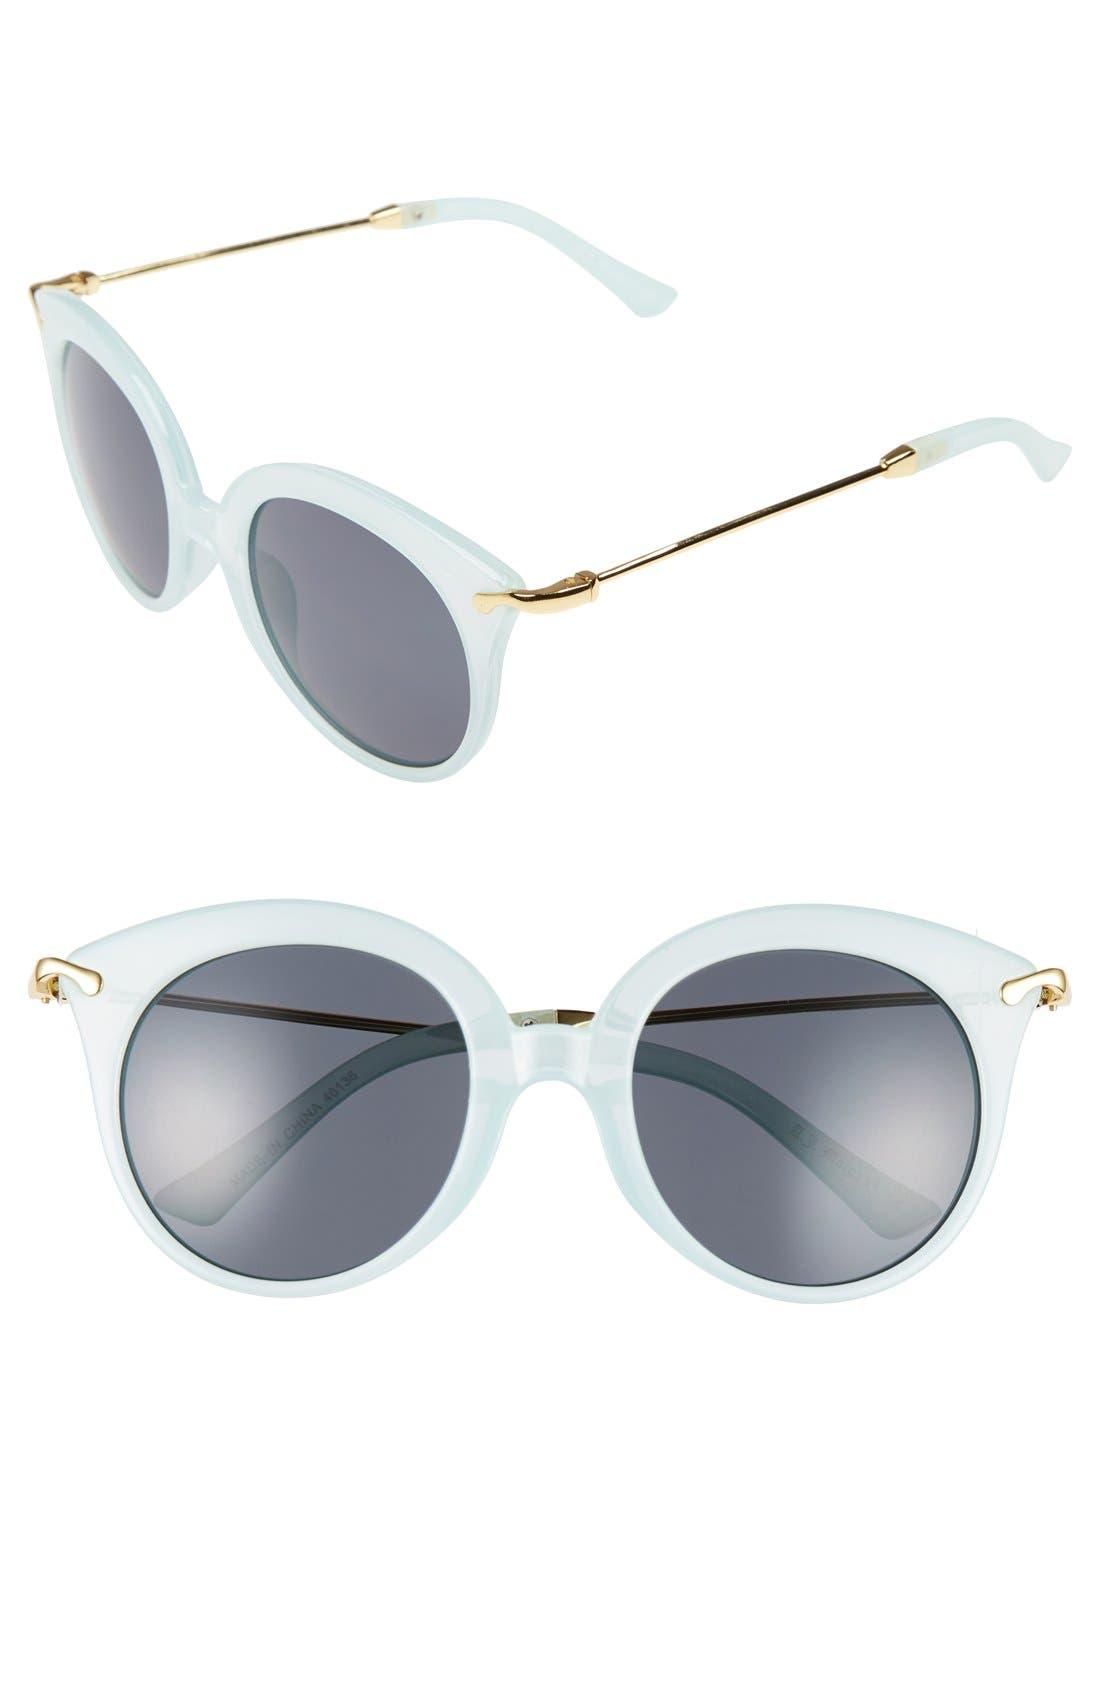 Main Image - A.J. Morgan 'Oh Baby' 50mm Cat Eye Sunglasses